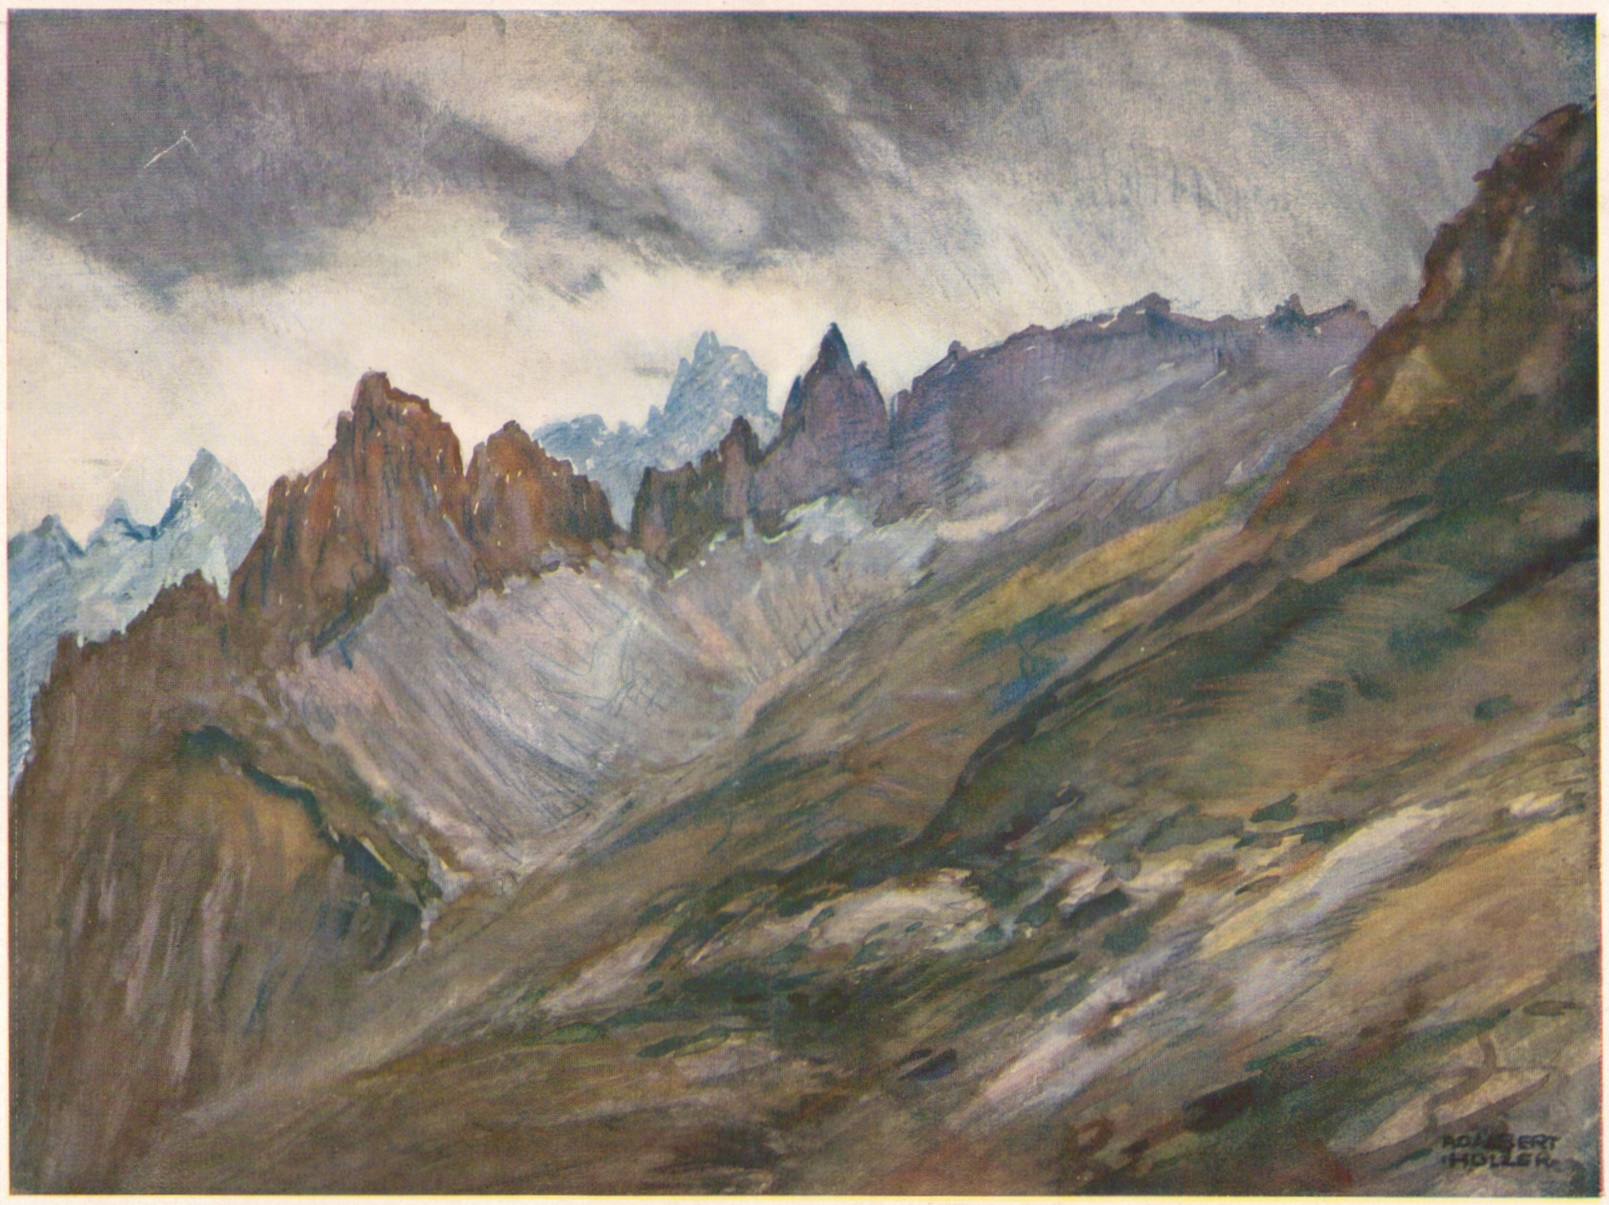 Adalbert Holzer - Nebeltreiben im Obermedriol um 1925p.jpg